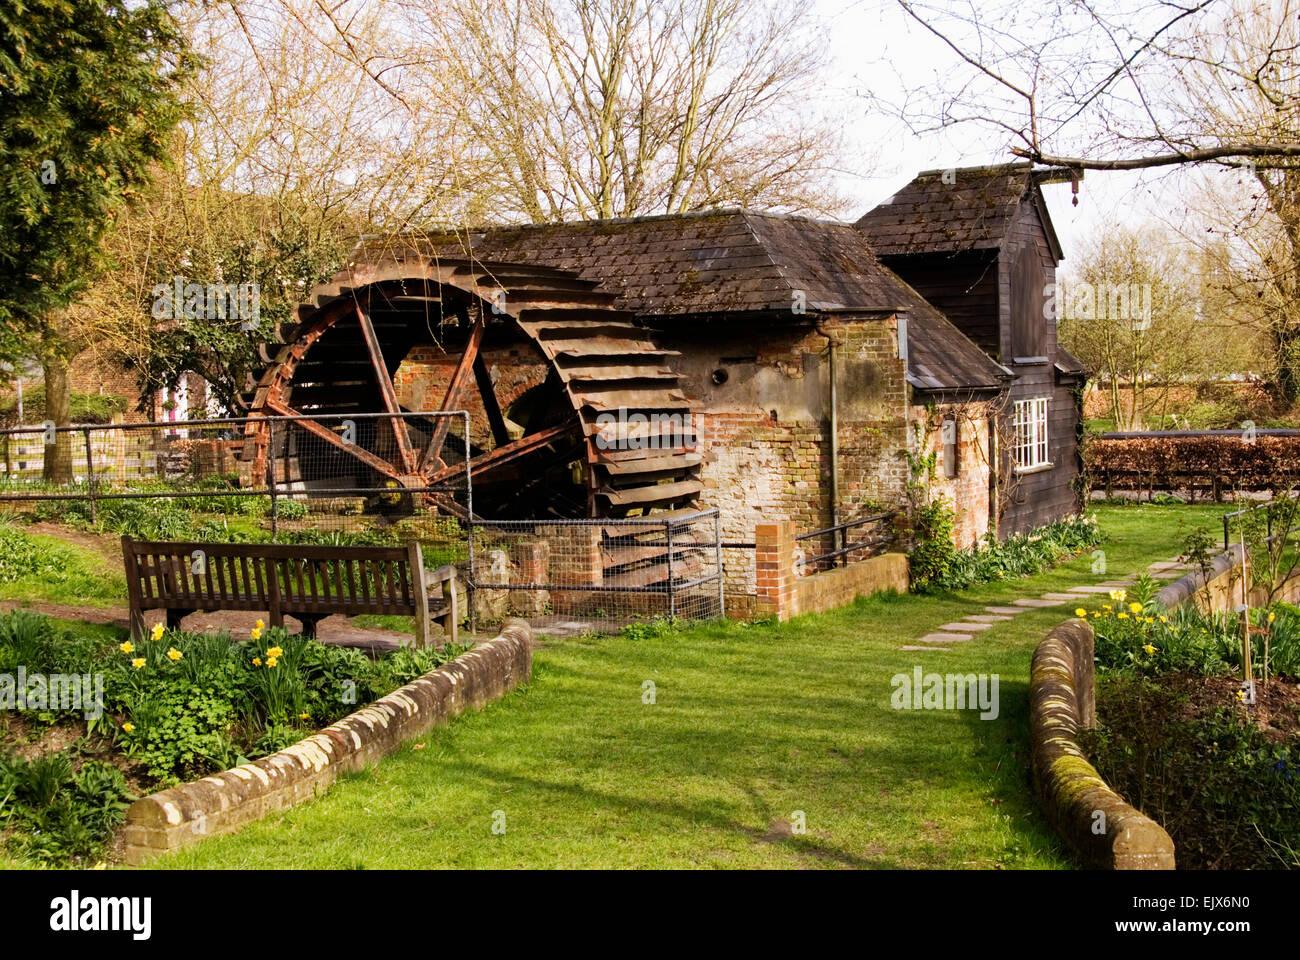 Bucks - High Wycombe - Pann Mill (restored)  Misbourne chalk stream - overshot water wheel - old mellow brickwork - Stock Image